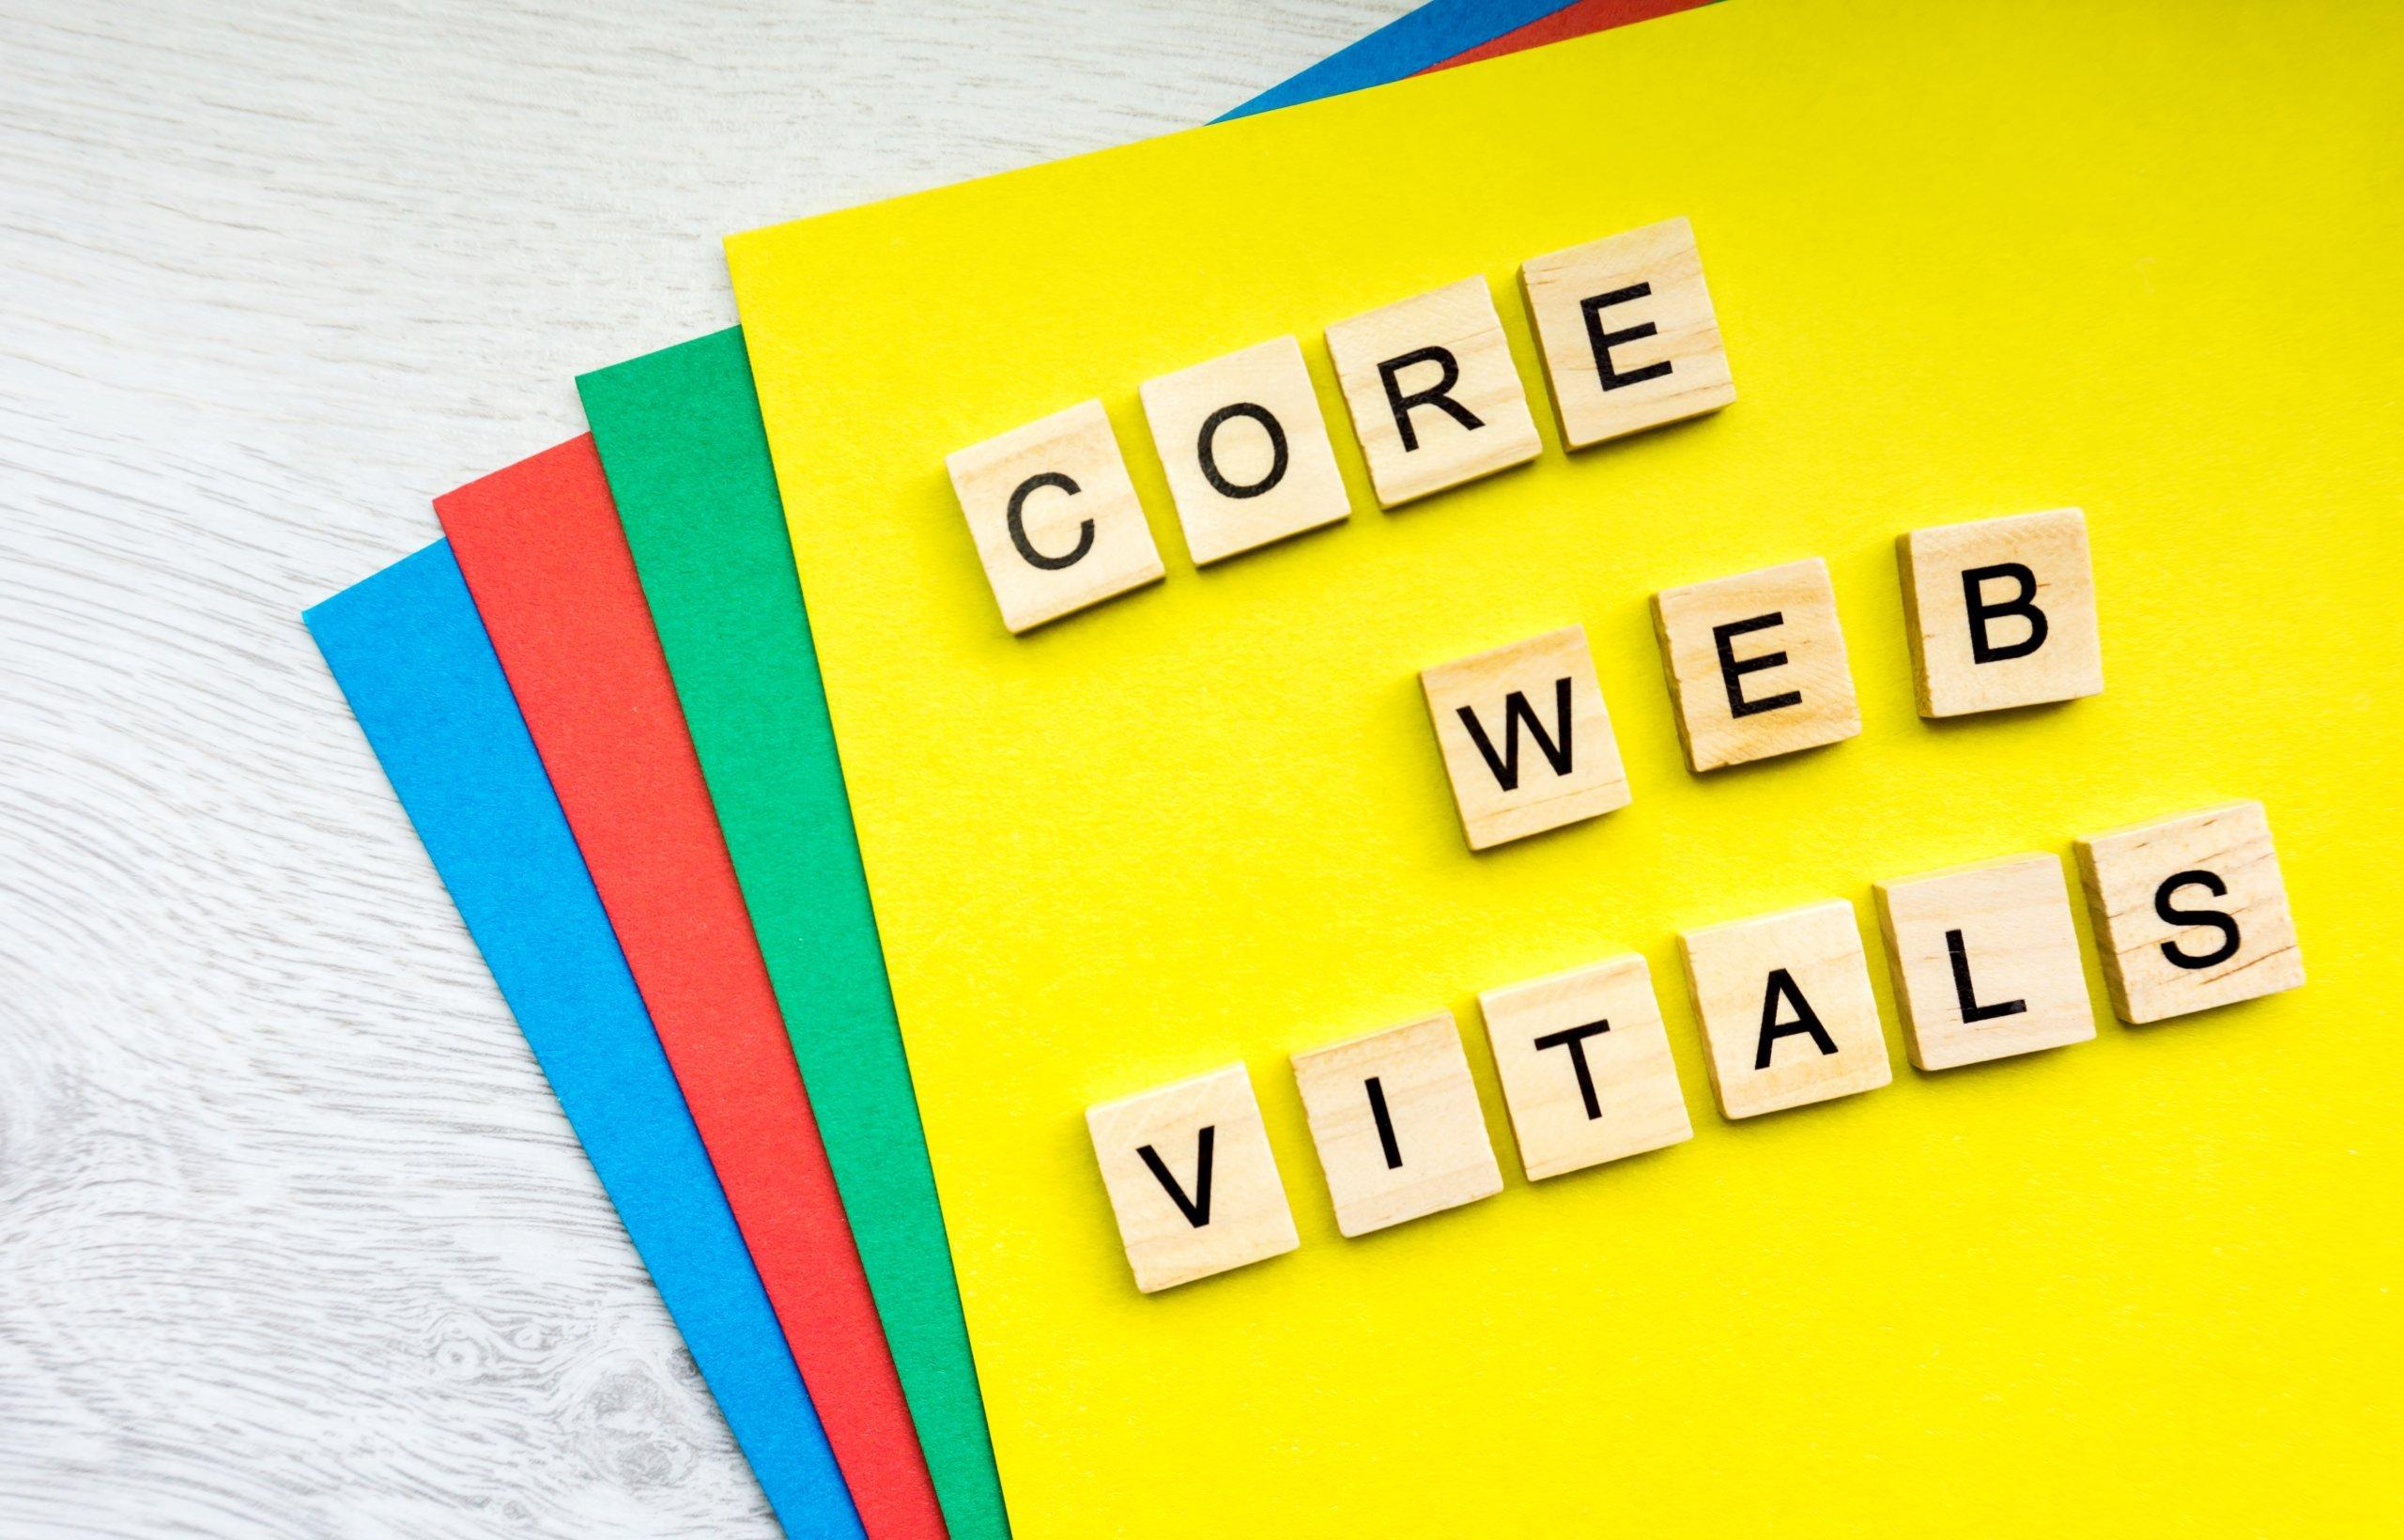 Core Web Vitals: How to Prepare Your Website for Google's Algorithm Update.